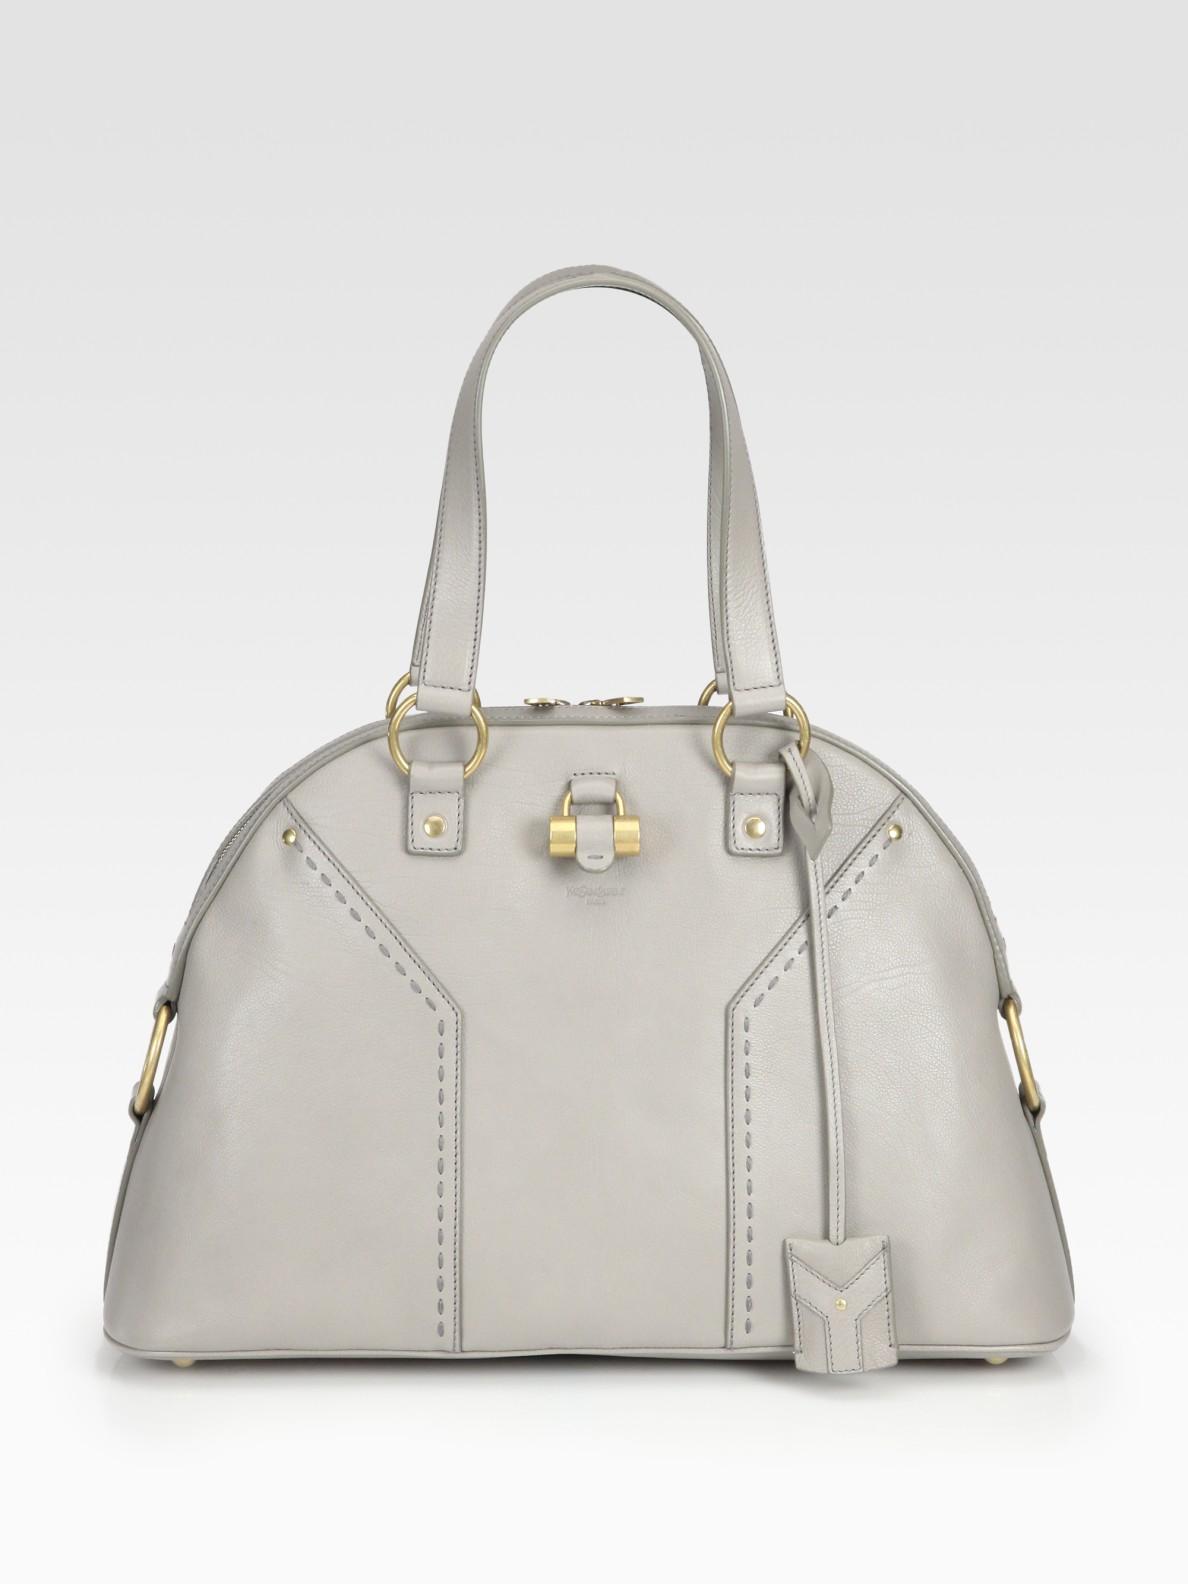 Saint laurent Ysl Large Muse Handbag in Beige (mouse) | Lyst